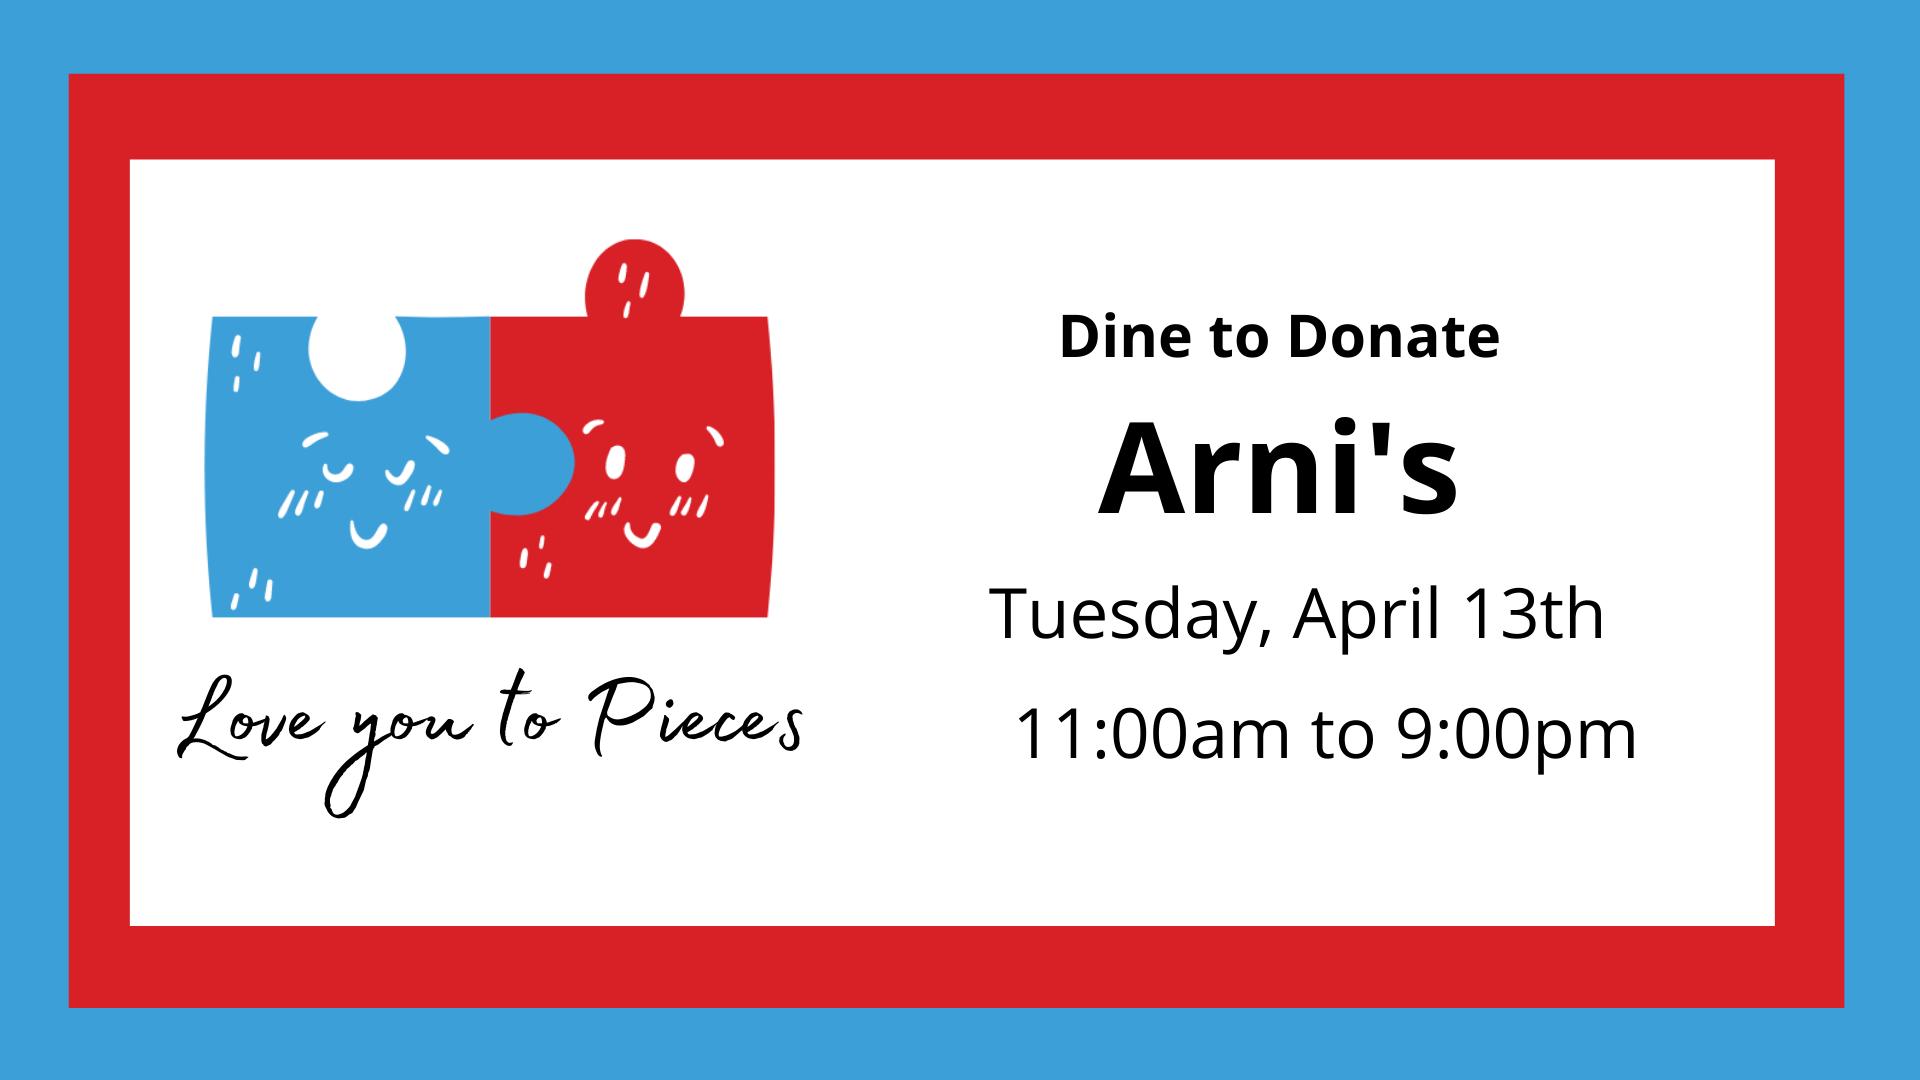 Dine to Donate - Arni's Restaurant (Greenwood)